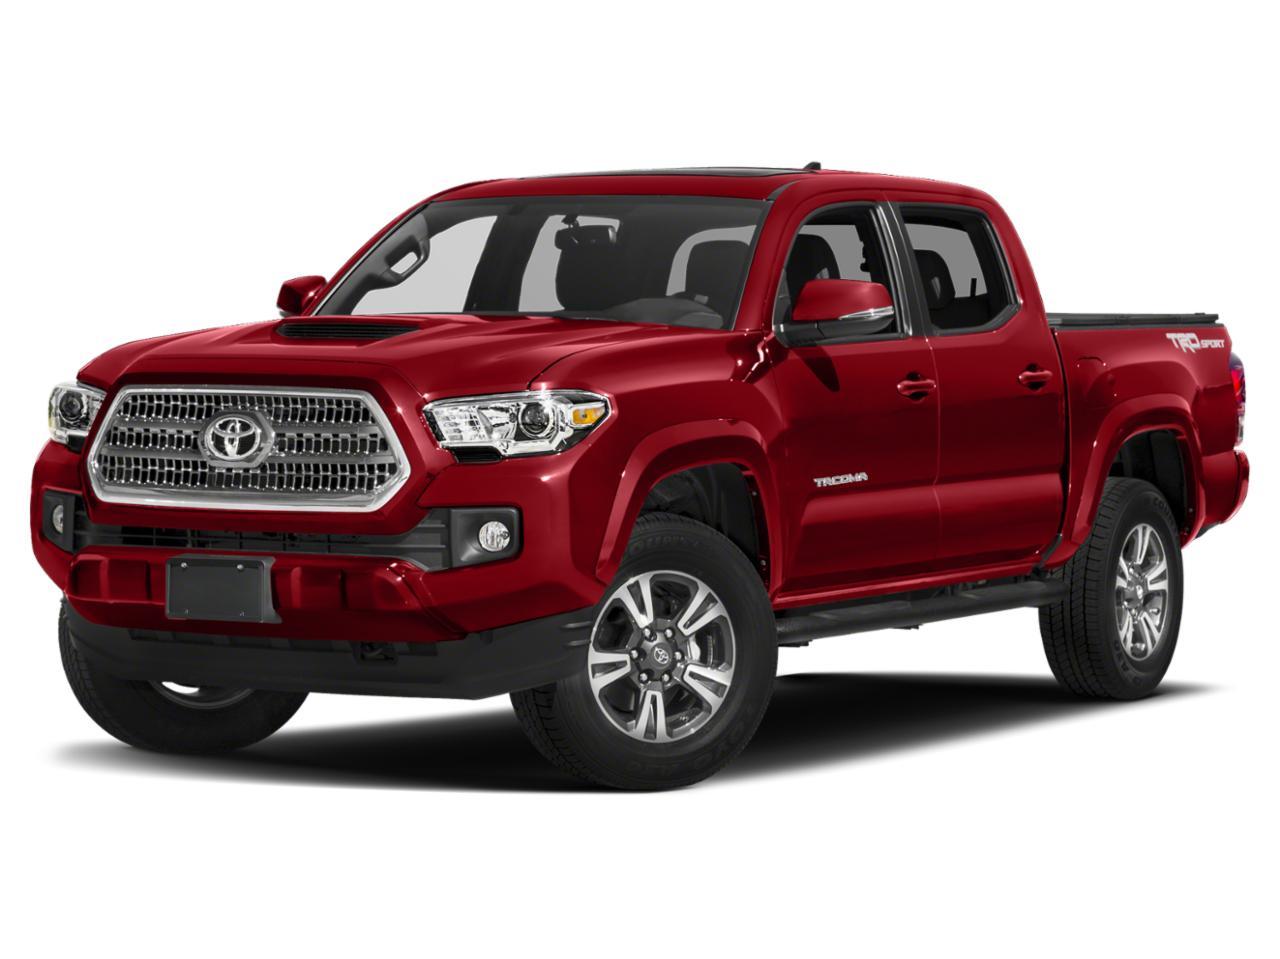 2018 Toyota Tacoma Vehicle Photo in San Antonio, TX 78238